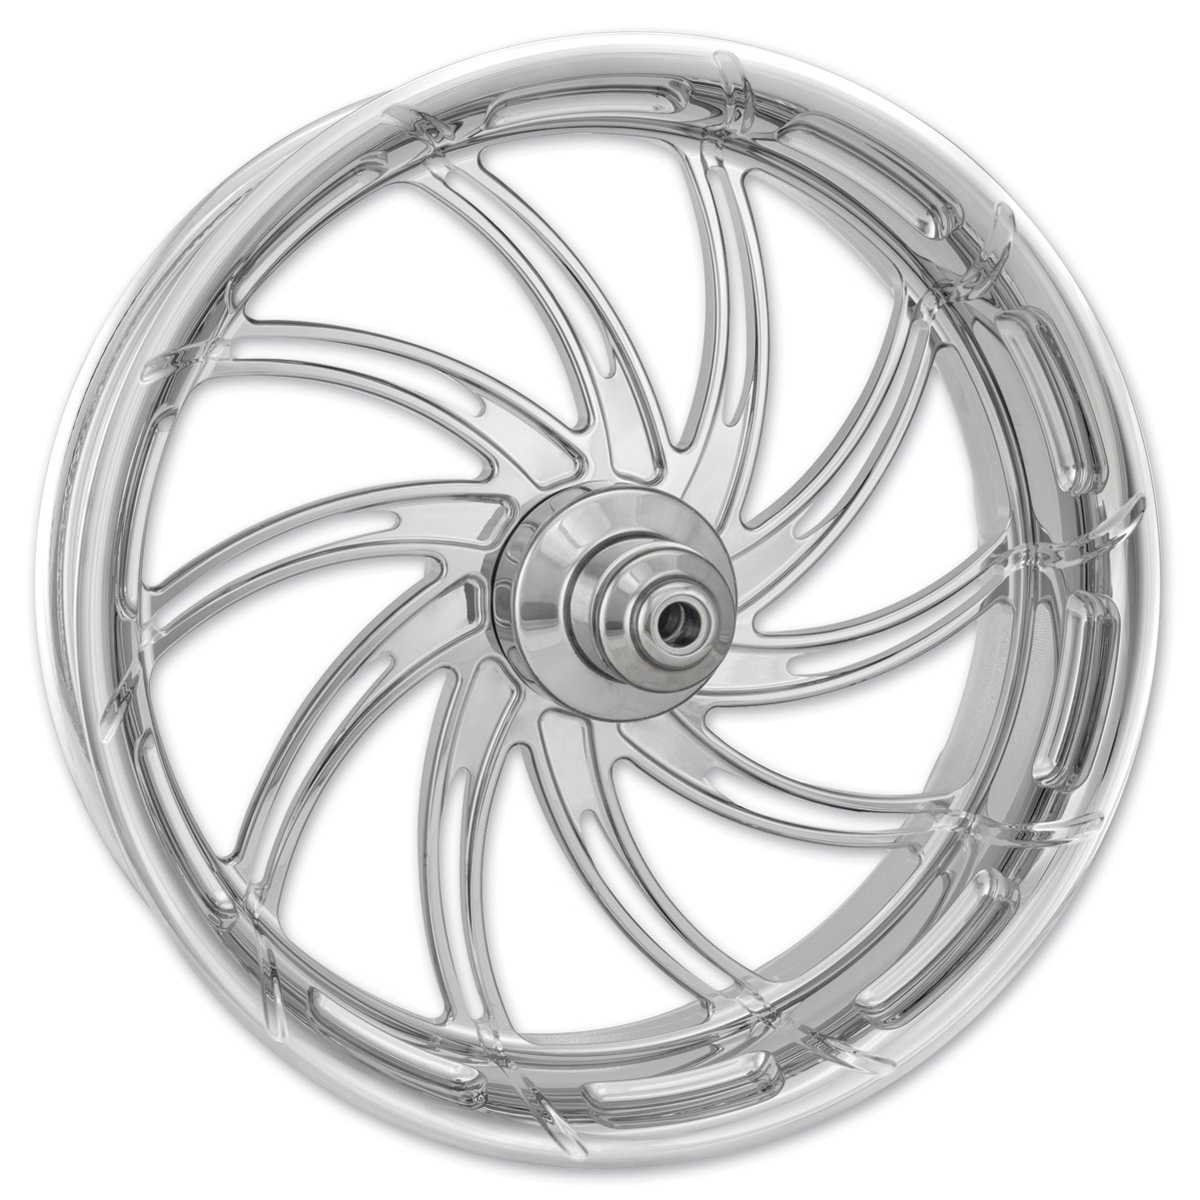 Performance Machine Supra Chrome Rear Wheel 17x6 ABS